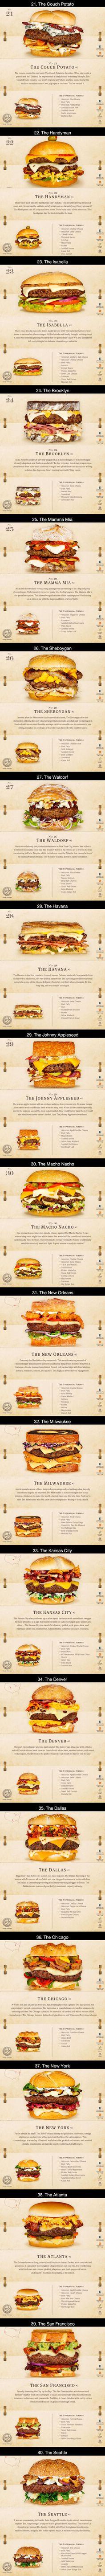 40 Glorious Burger Combinations Part 2